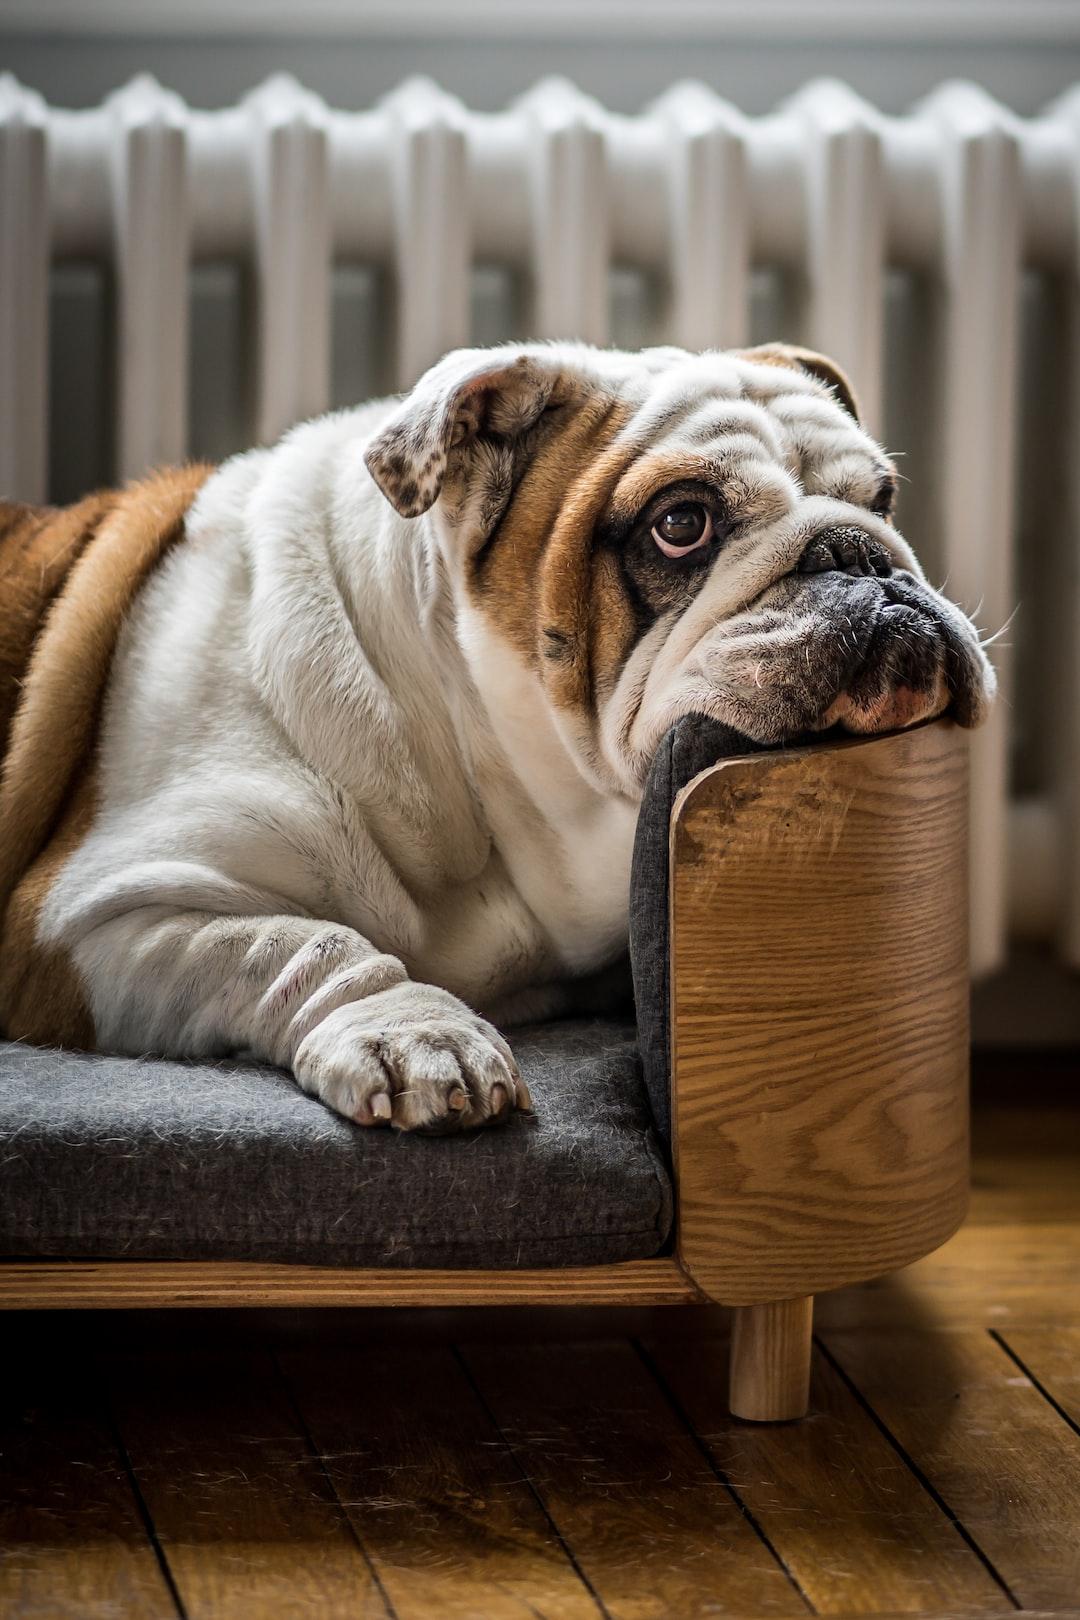 Helmut the english Bulldog